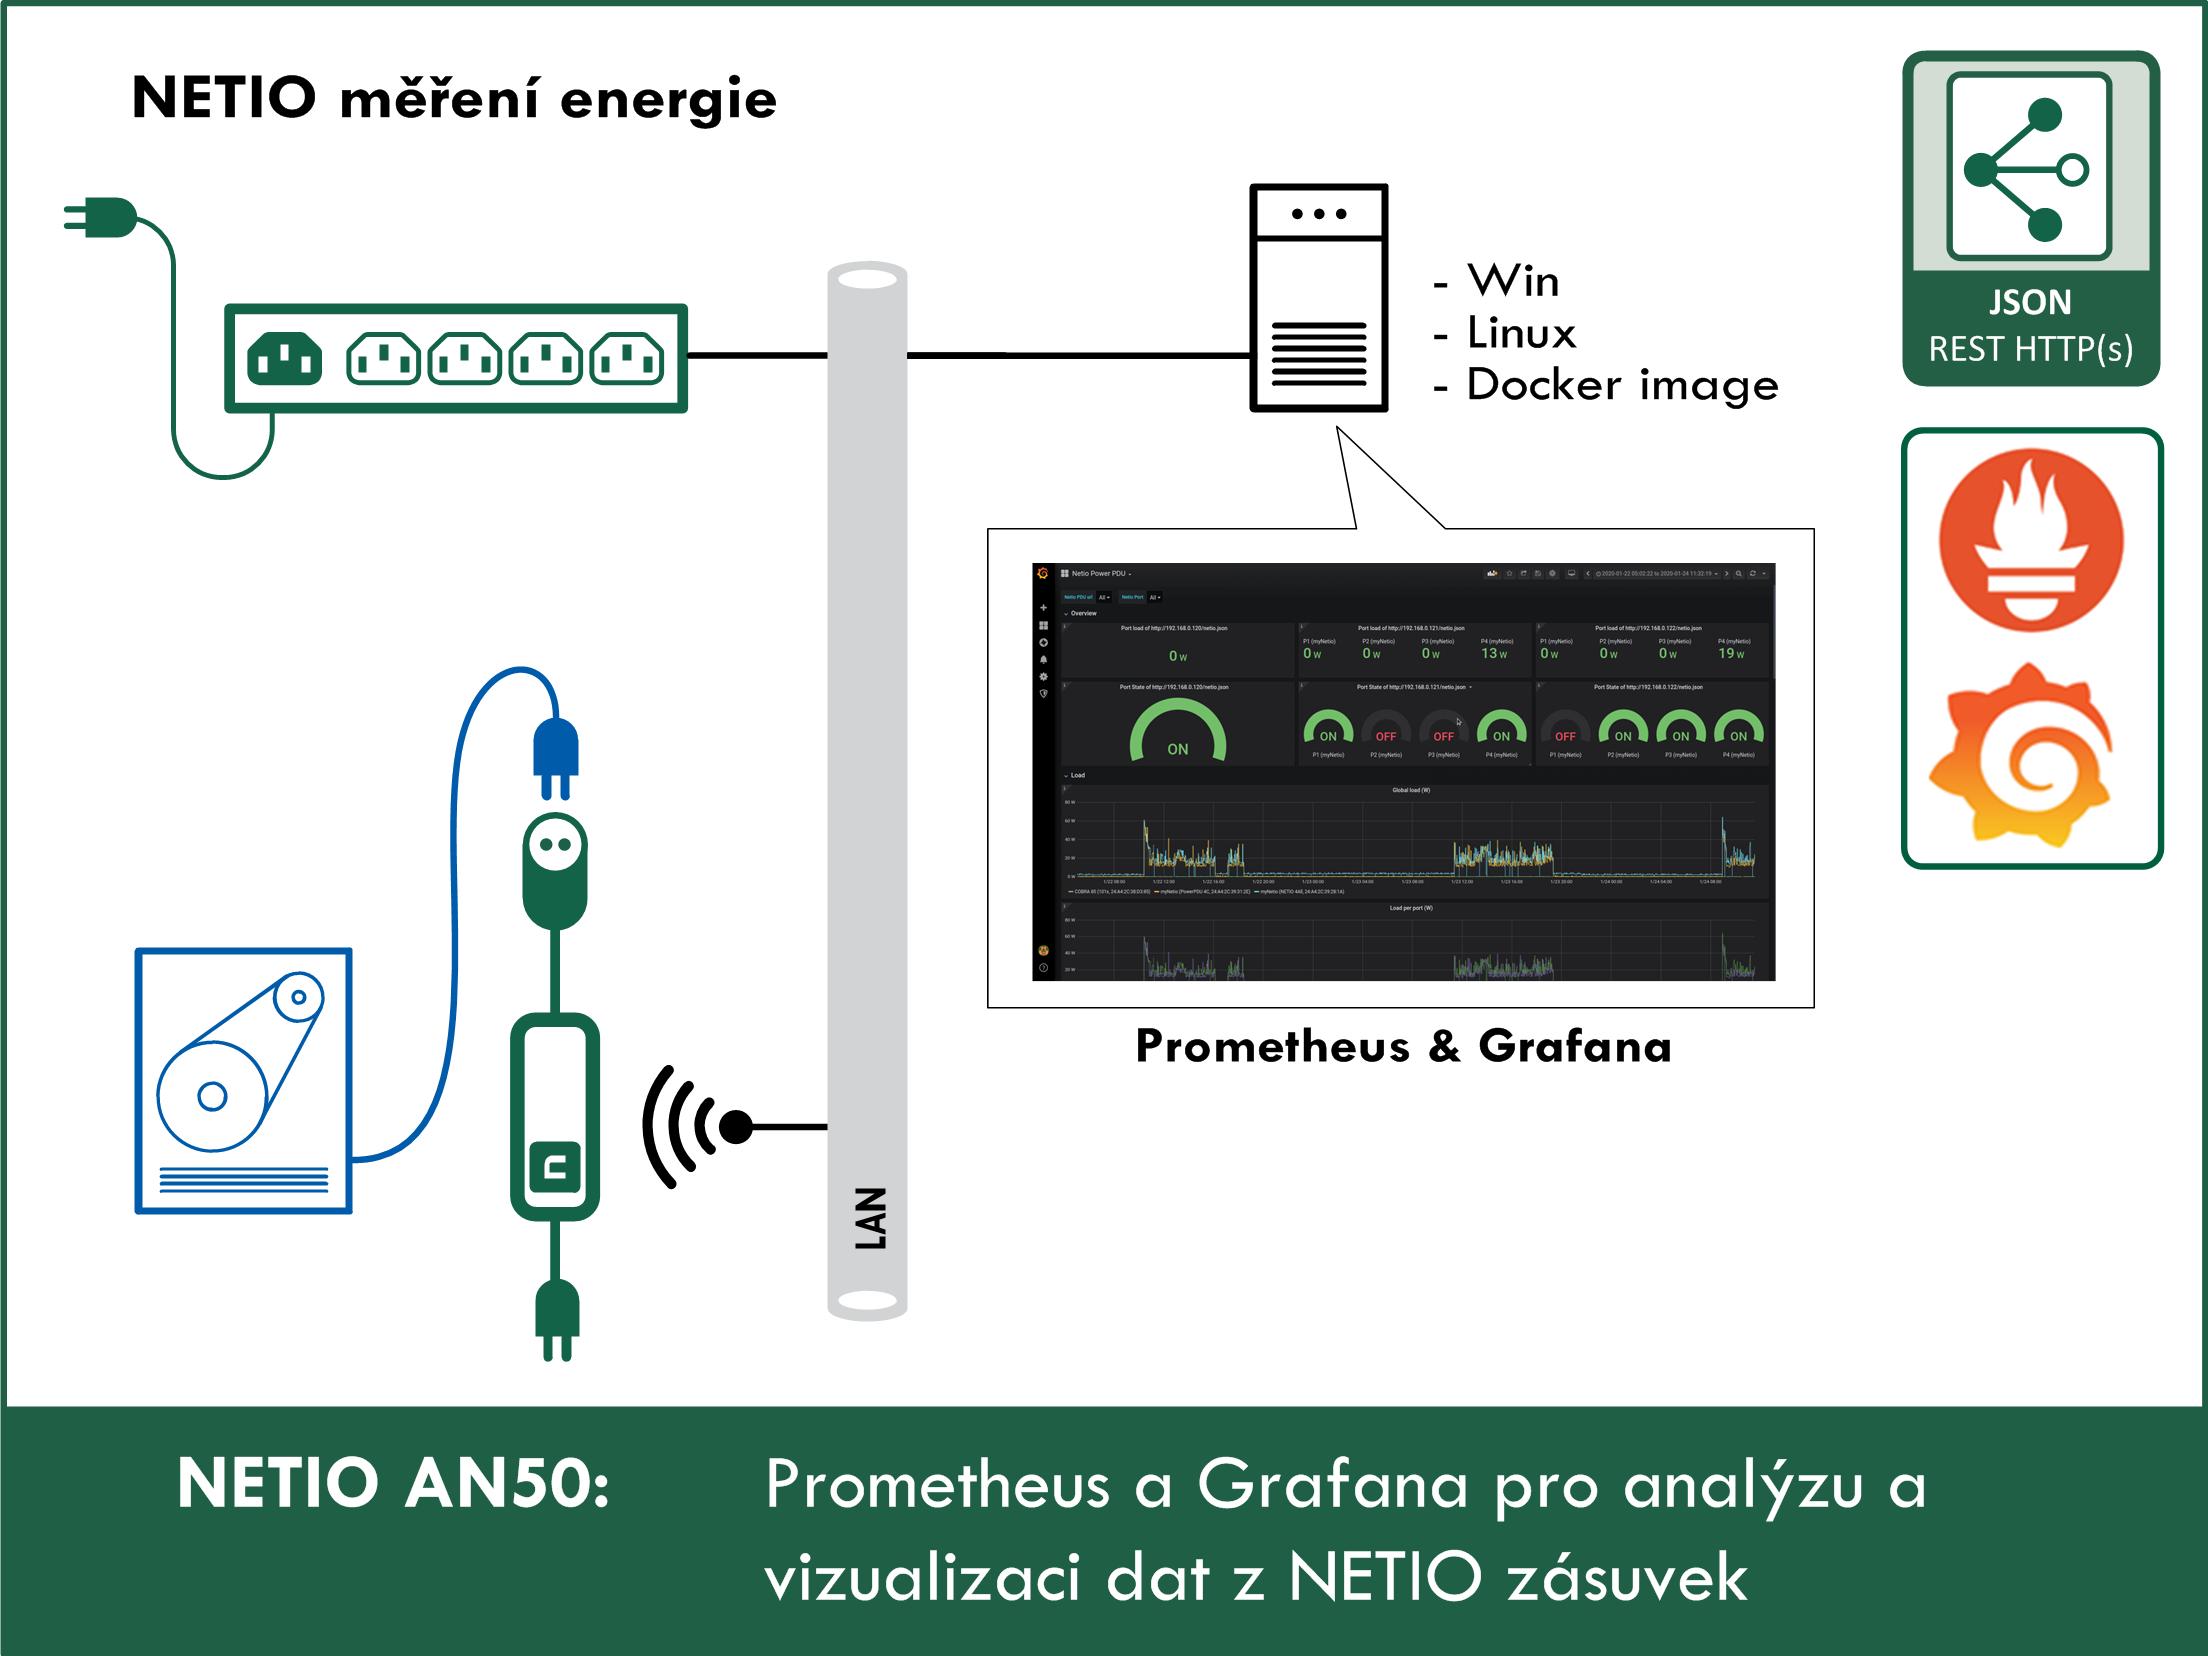 AN50-Prometheus-a-Grafana-pro-analyzu-a-vizualizaci-dat-z-NETIO-zasuvek